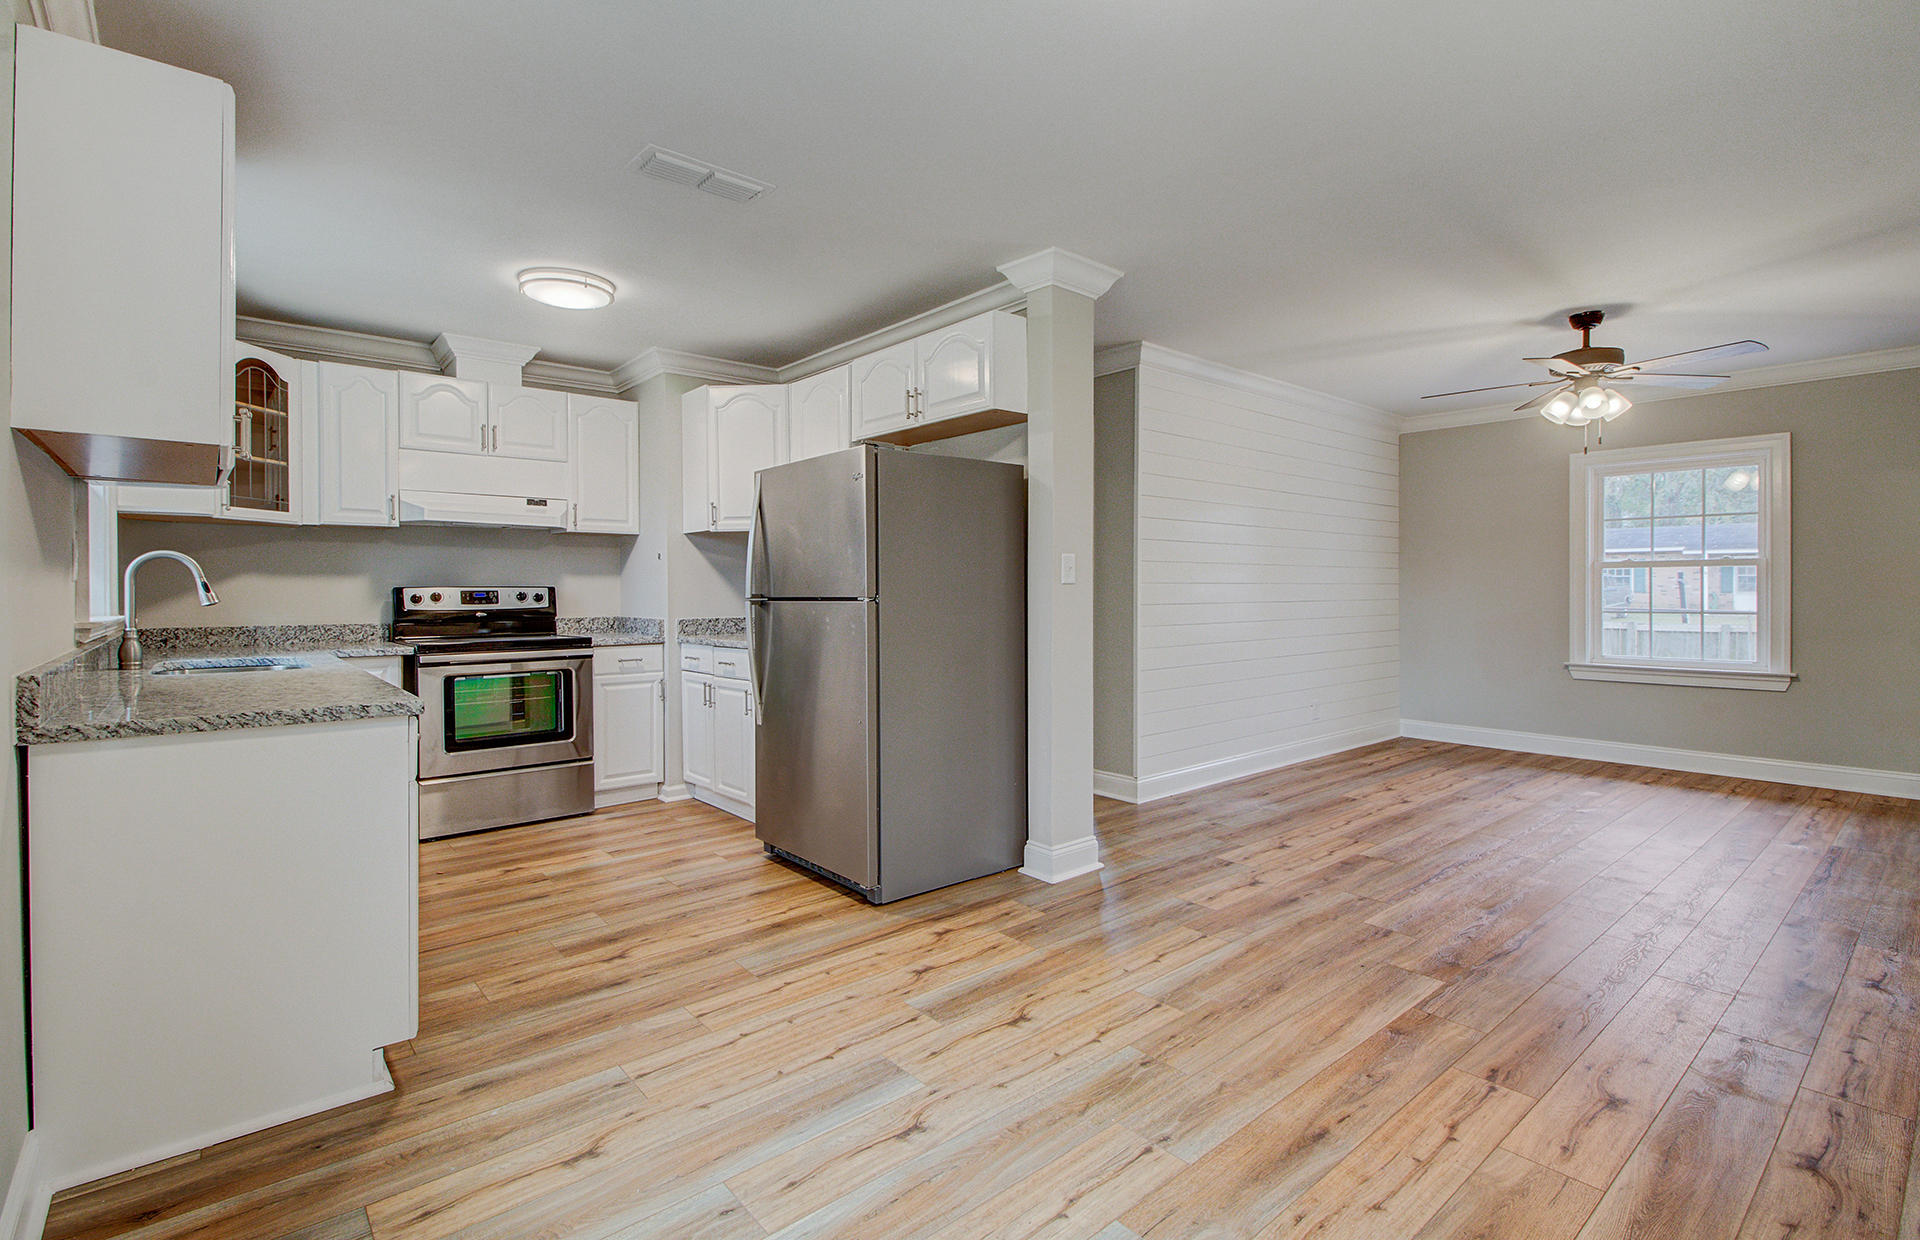 Sedgefield Section I Homes For Sale - 30 Aldene, Goose Creek, SC - 19